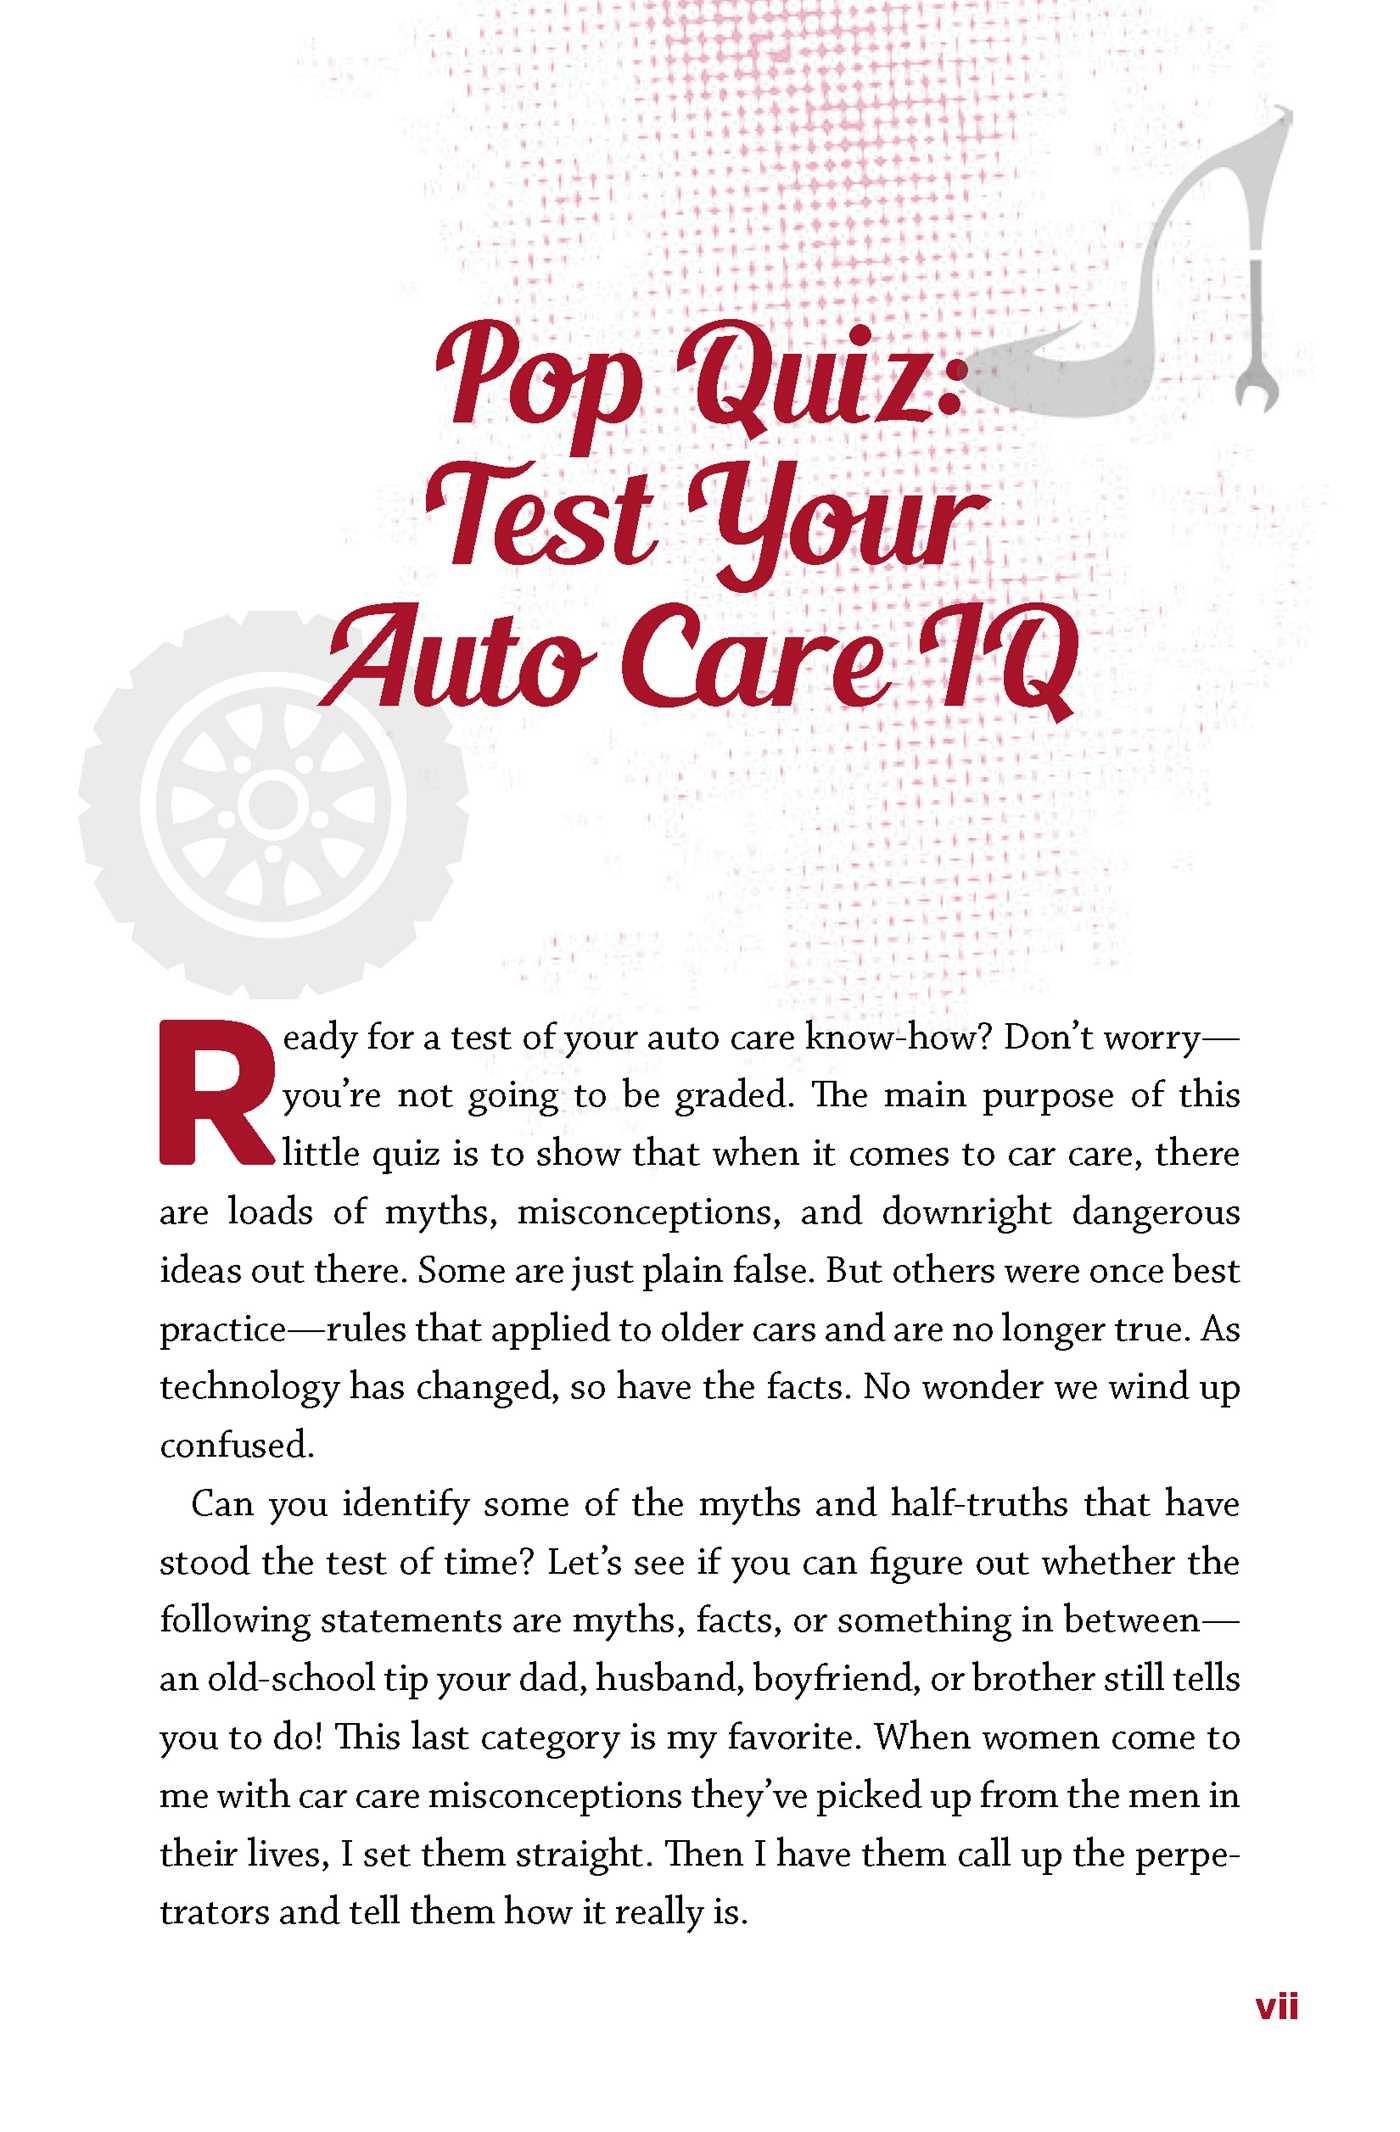 Girls auto clinic glove box guide 9781501144110.in01